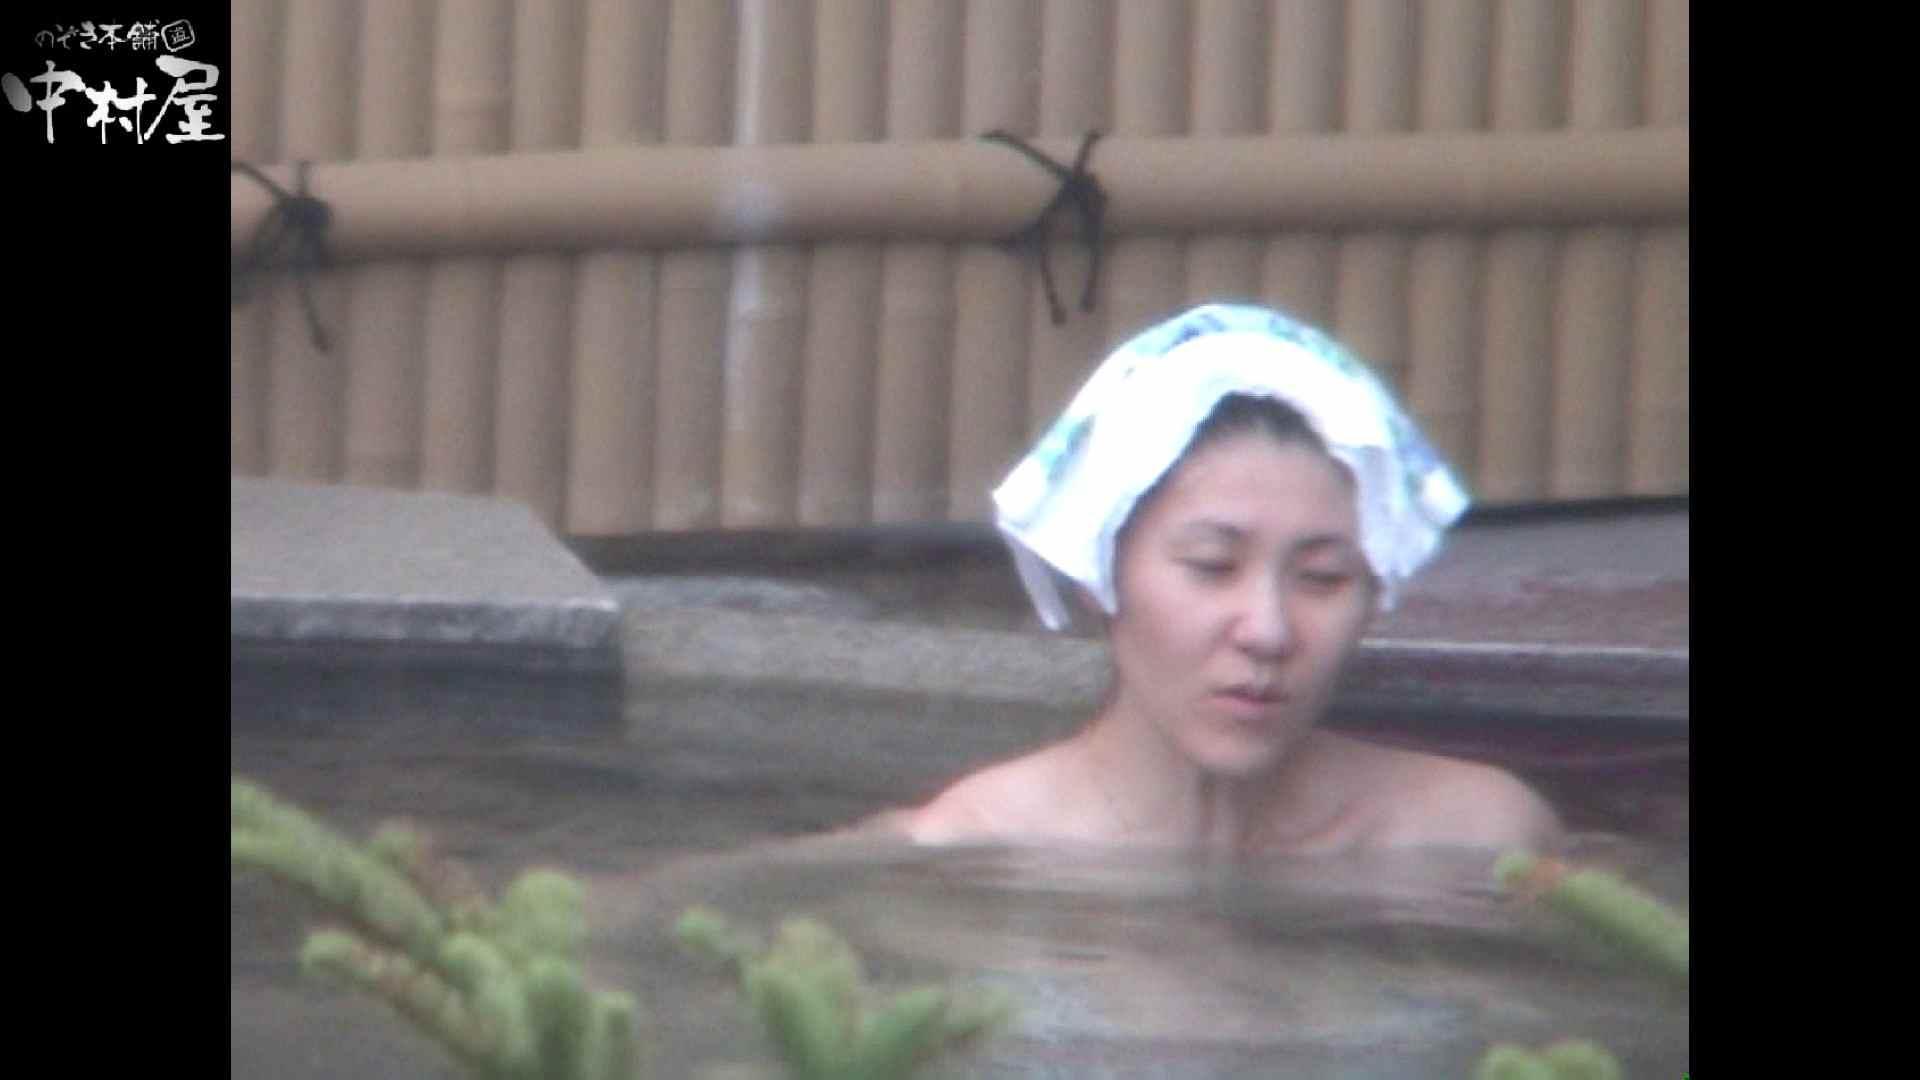 Aquaな露天風呂Vol.925 盗撮   OLセックス  52画像 22